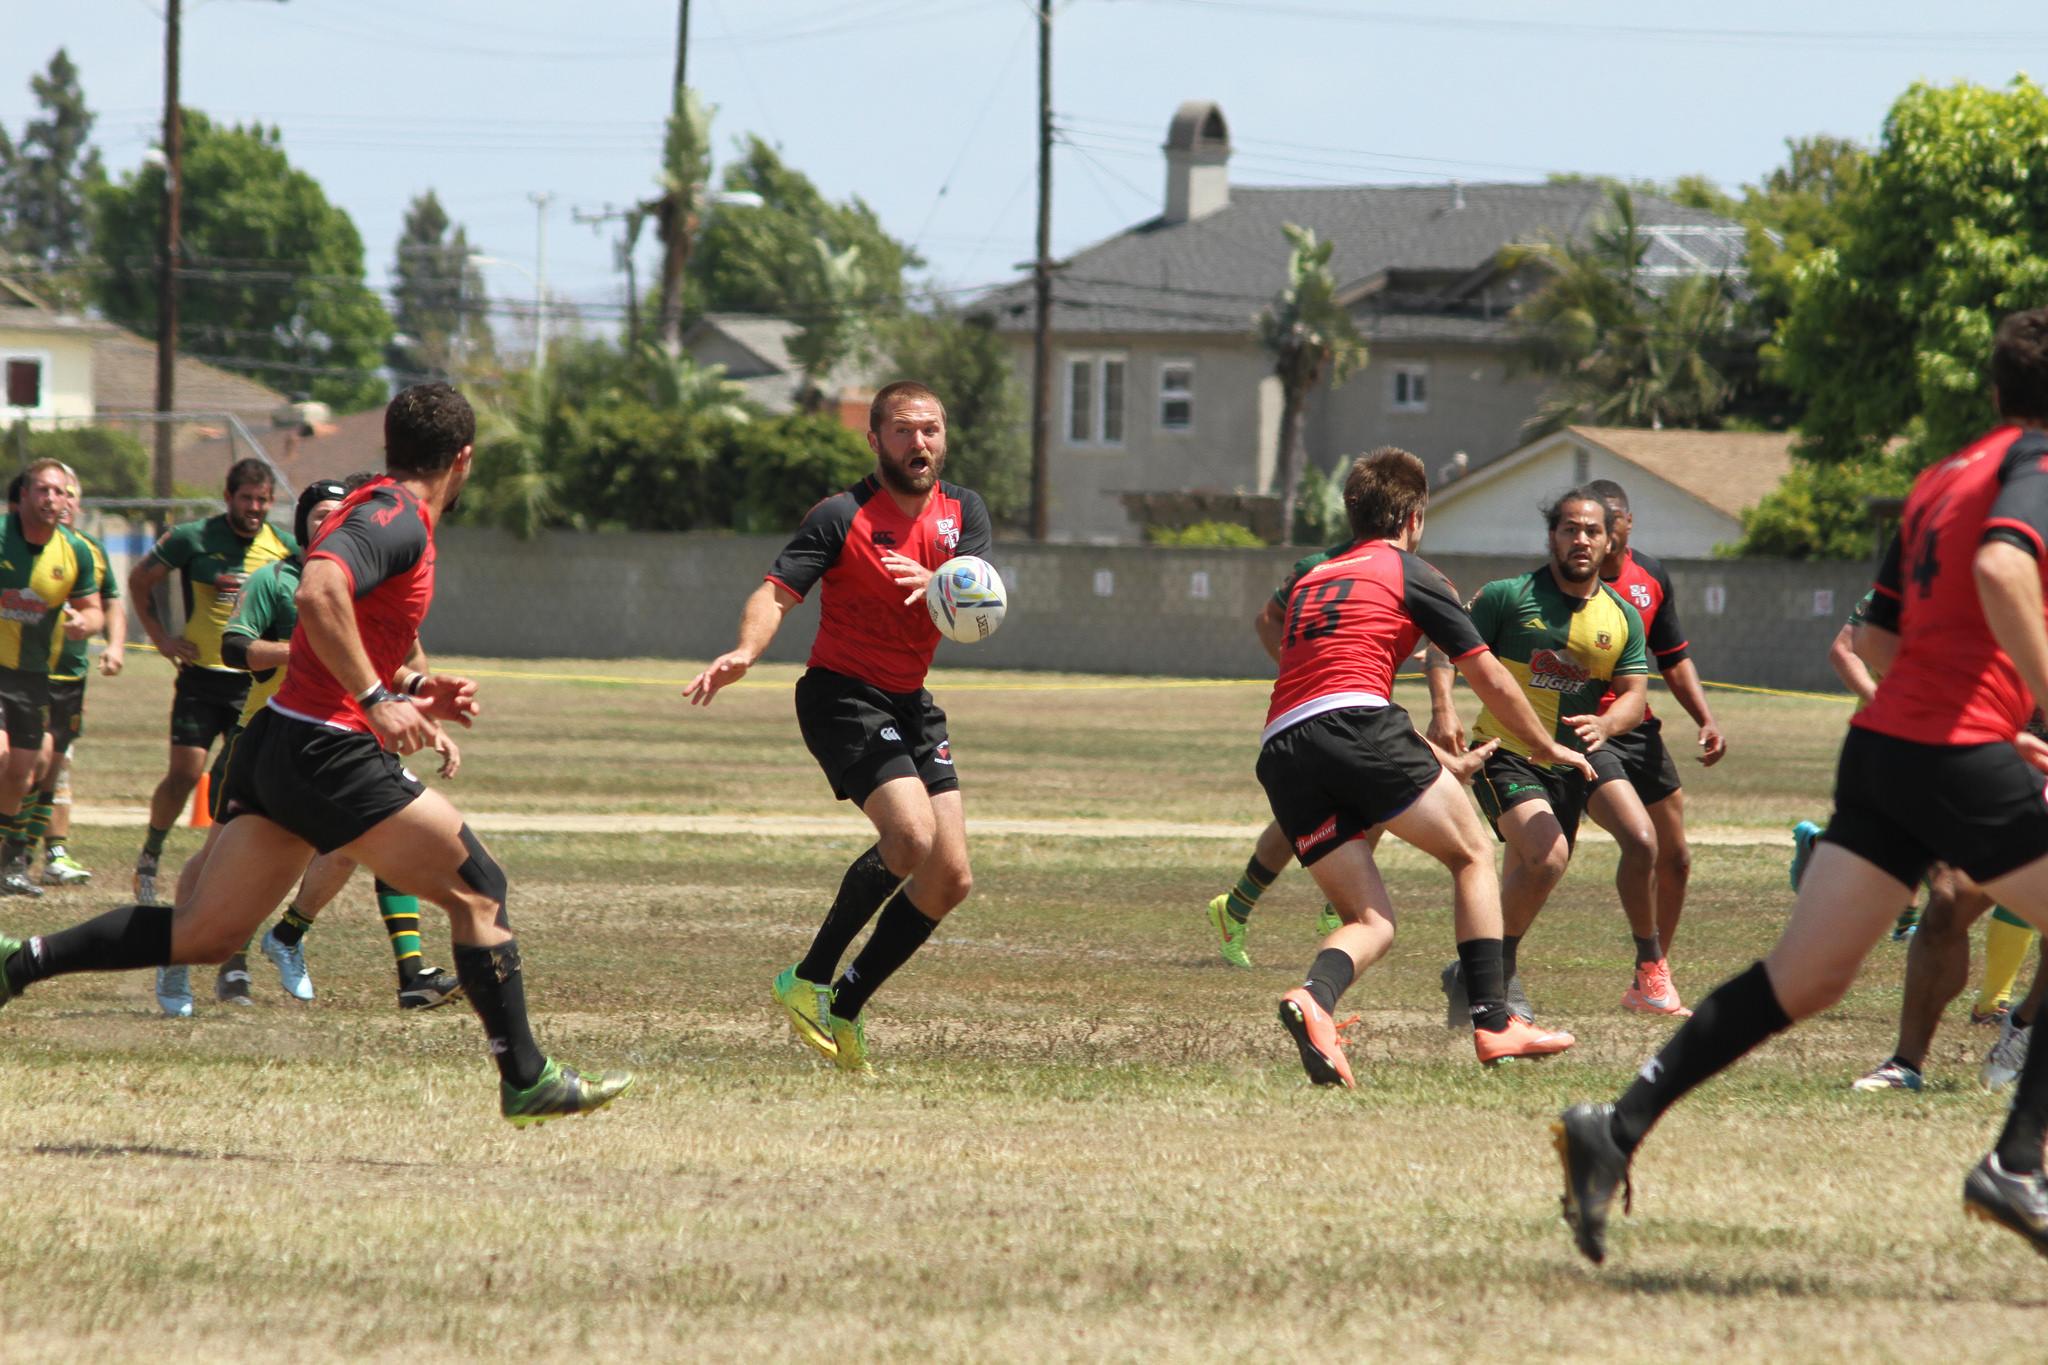 Ventura vs HB 2016 SCRFU Championship Game. Photo Michael Zubach.